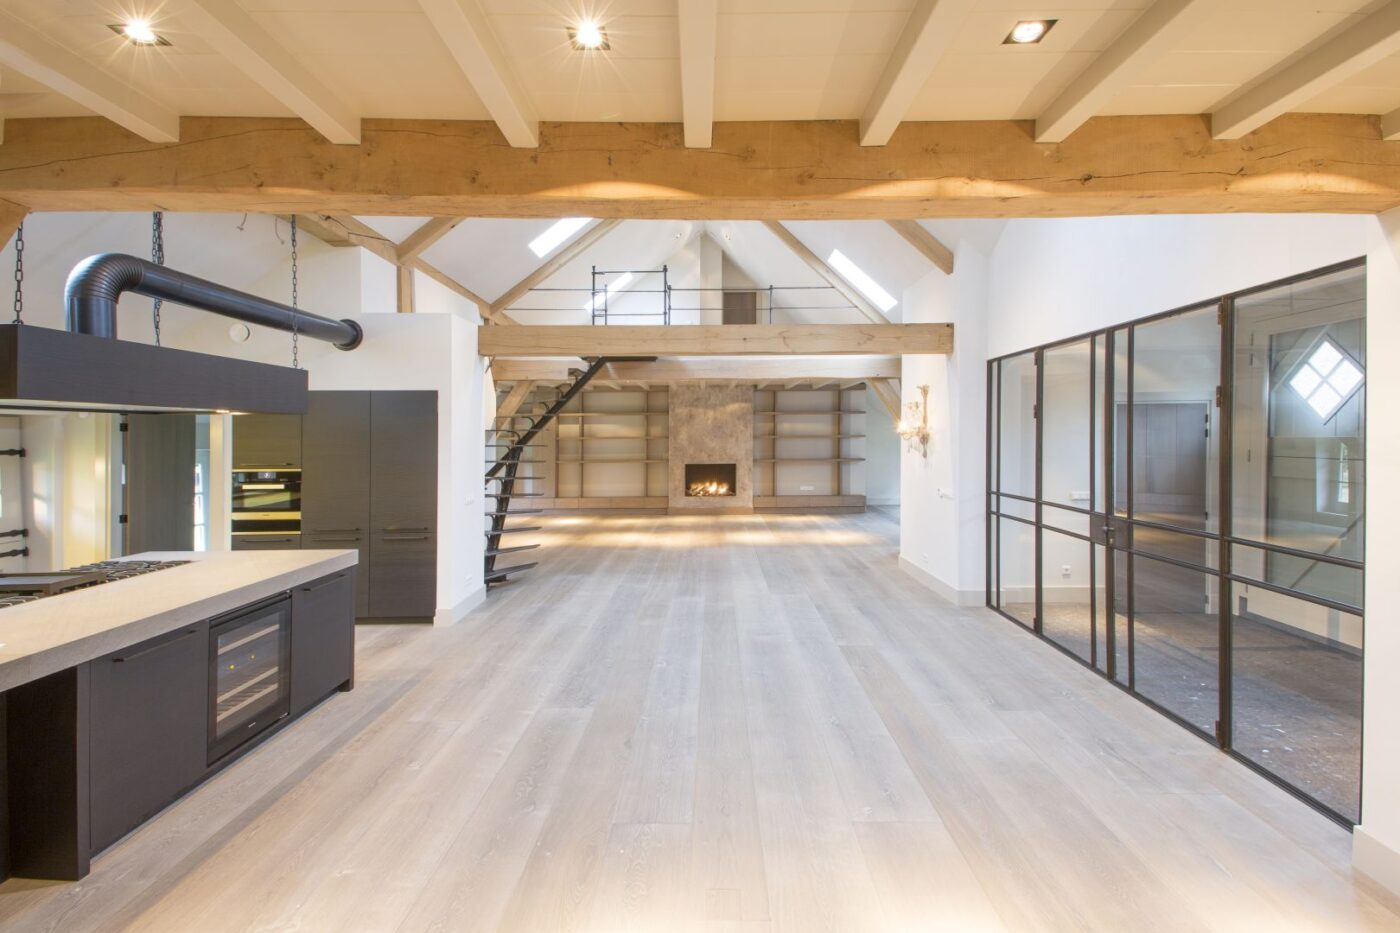 Lichte houten planken vloer in Blaricum